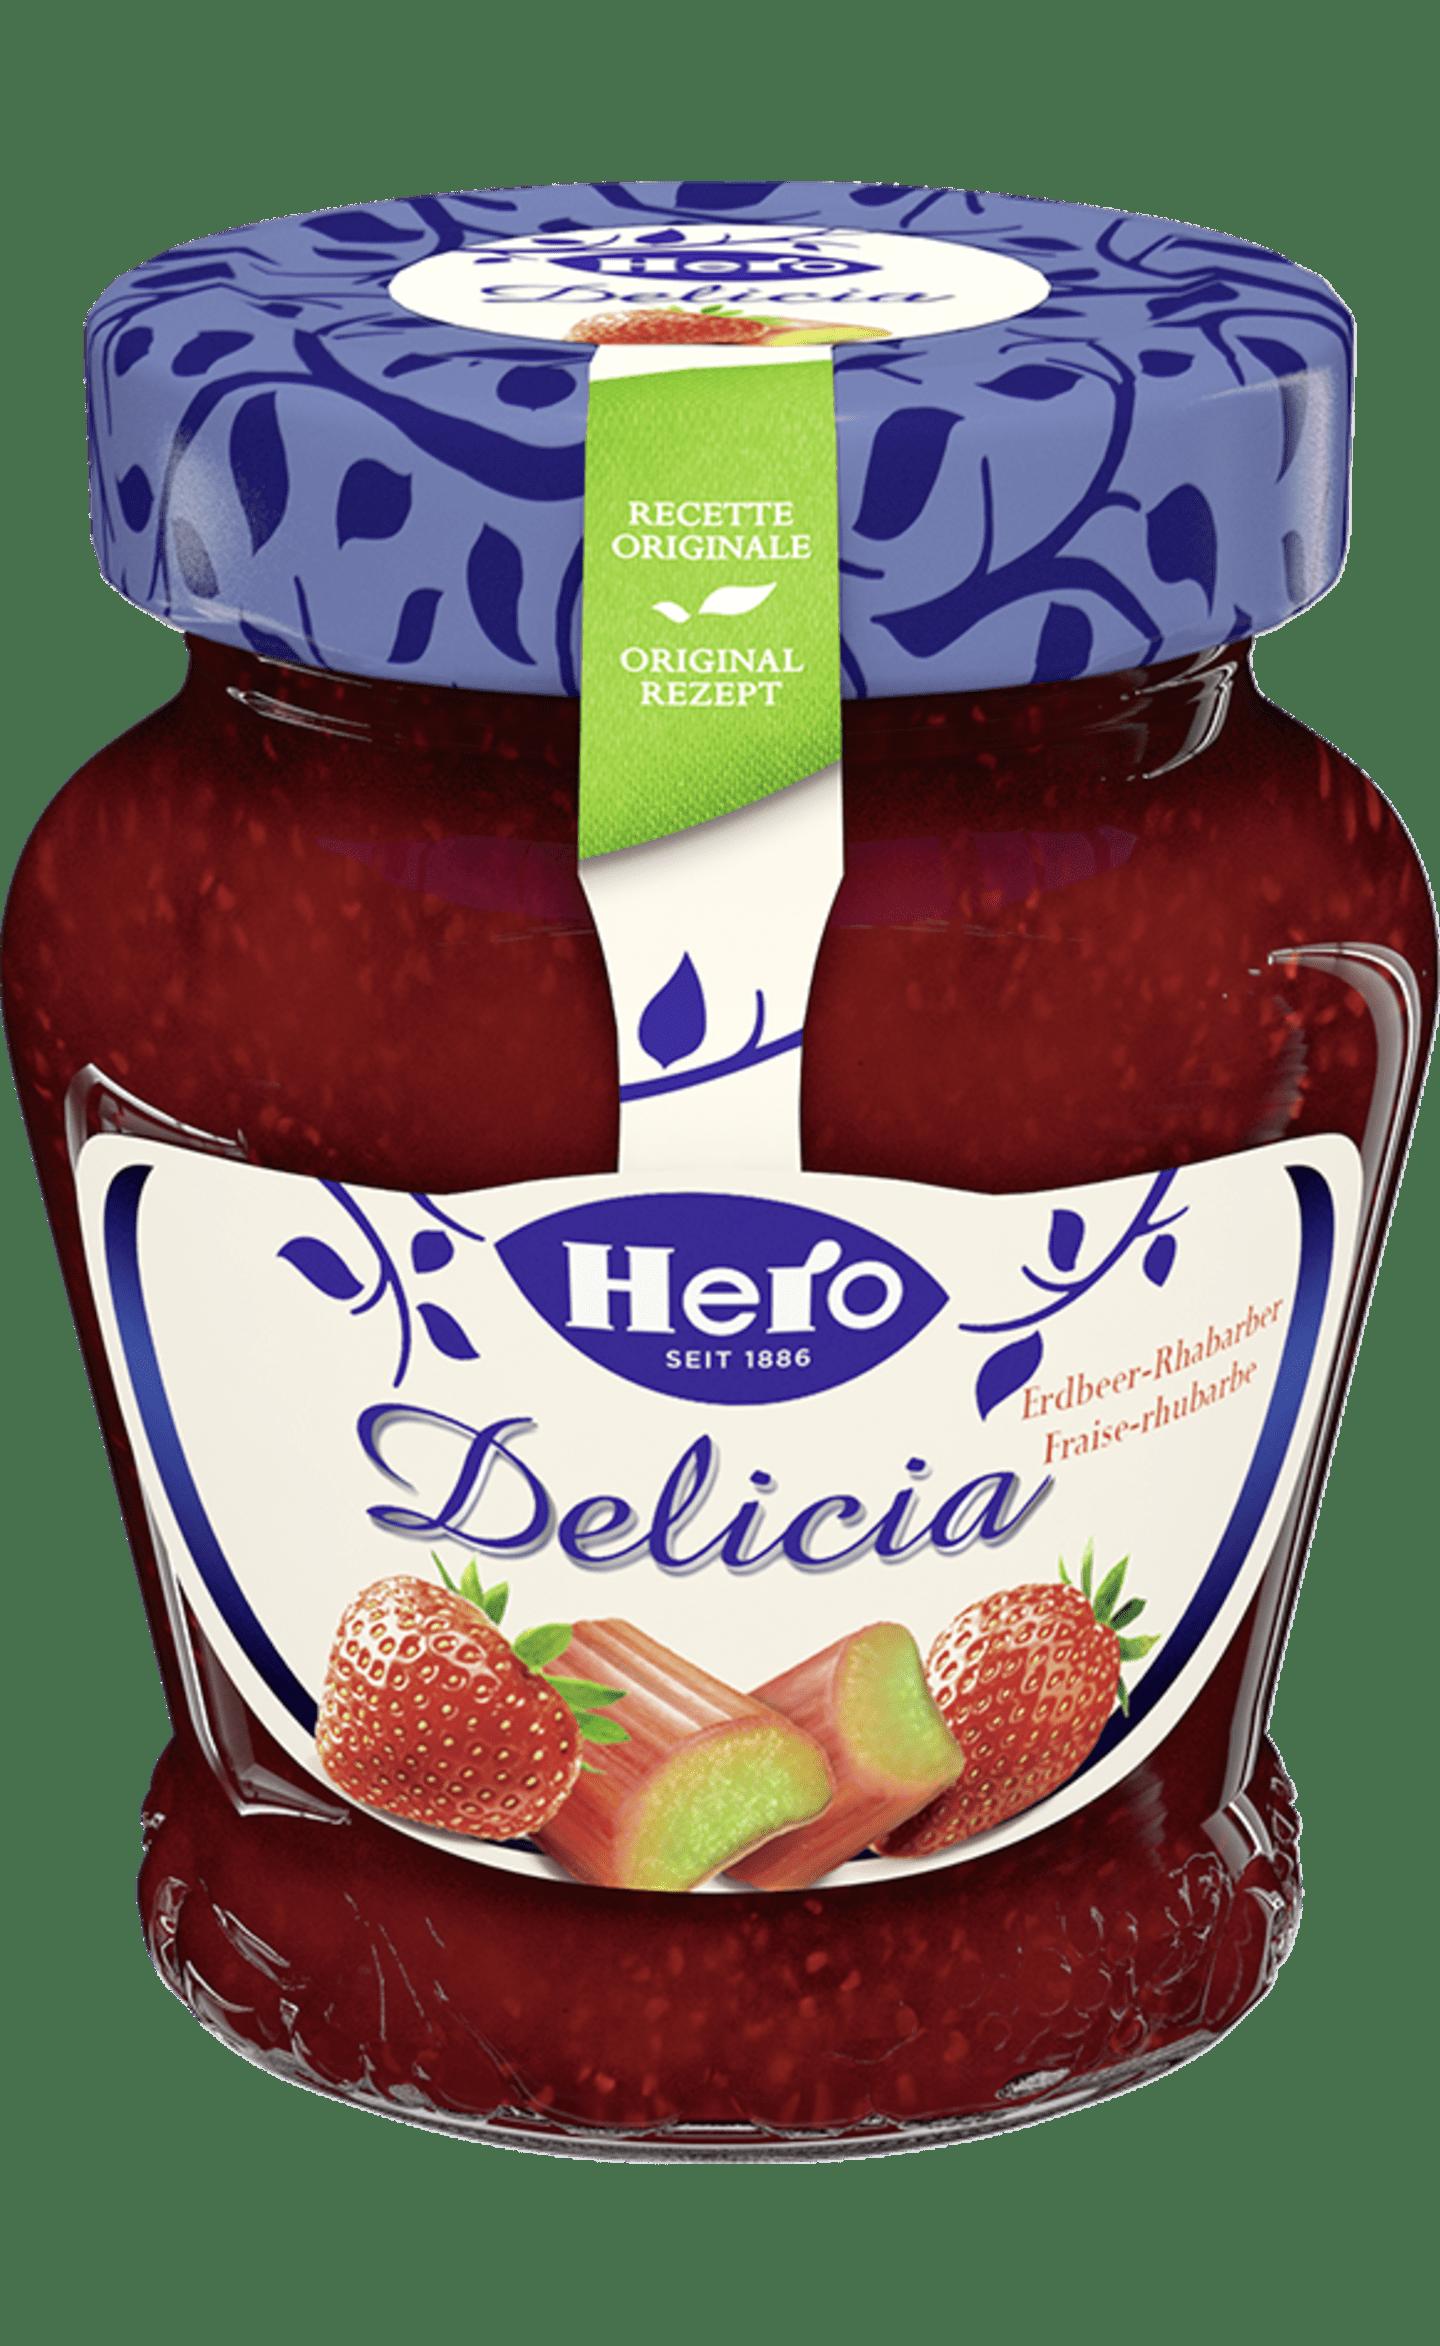 Hero Delicia Konfitüre | Erdbeer Rhabarber